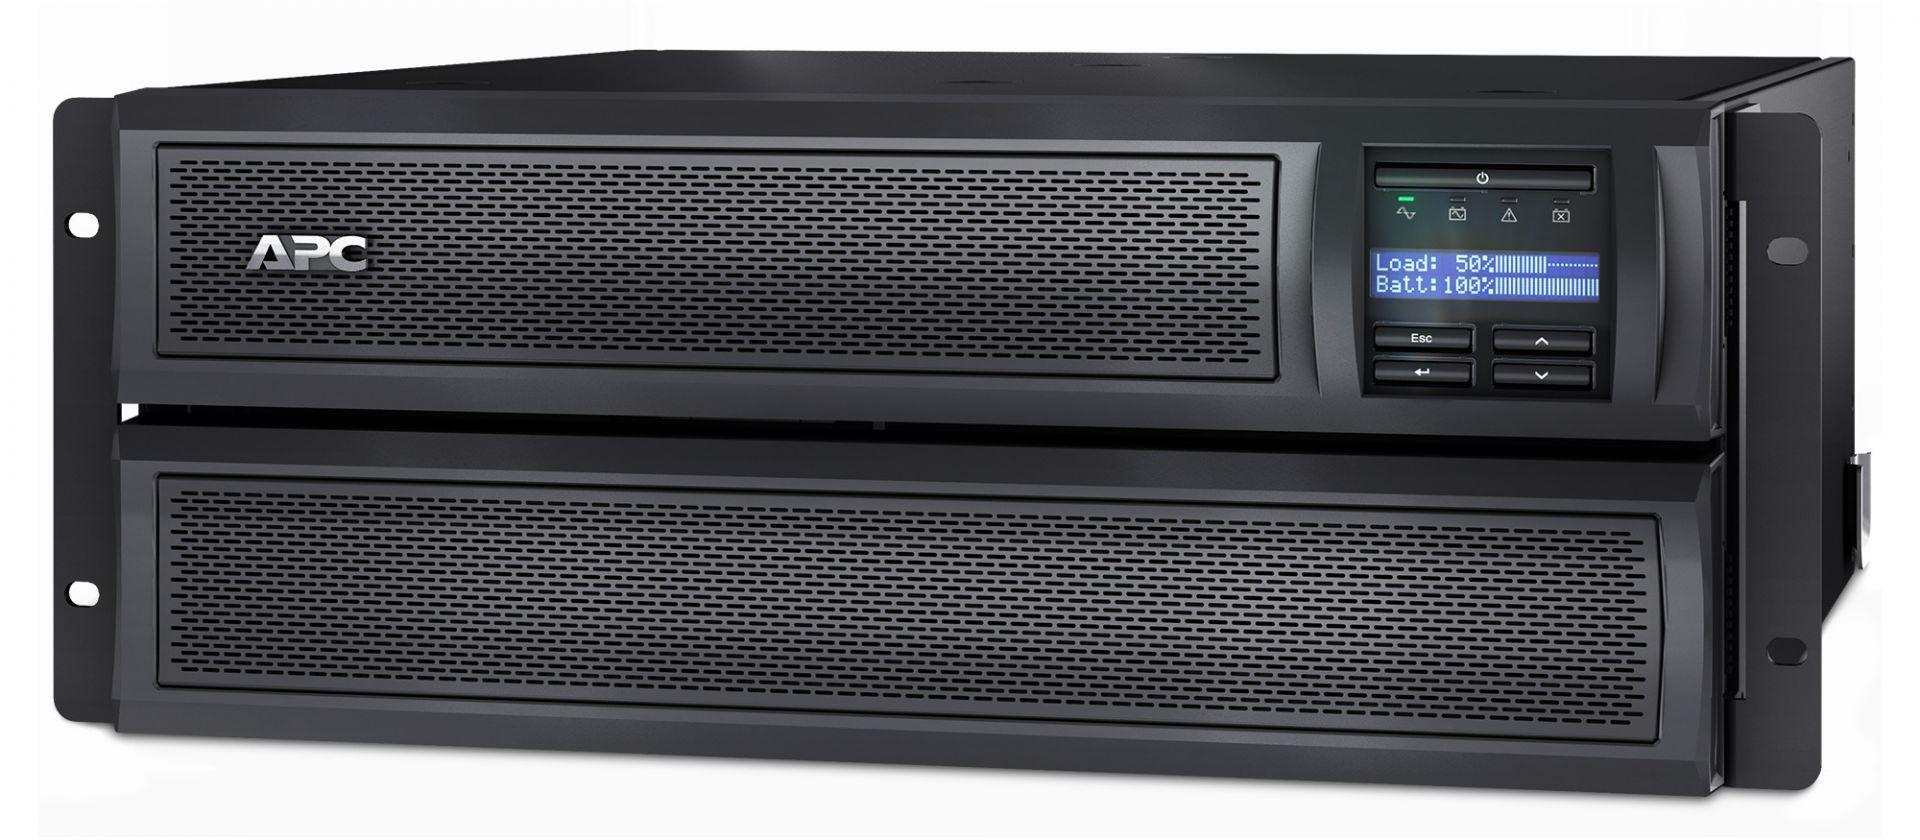 APC Smart-UPS X 2200VA Short Depth Tower/Rack Convertible LCD 200-240V with Network Card (SMX2200HVNC)